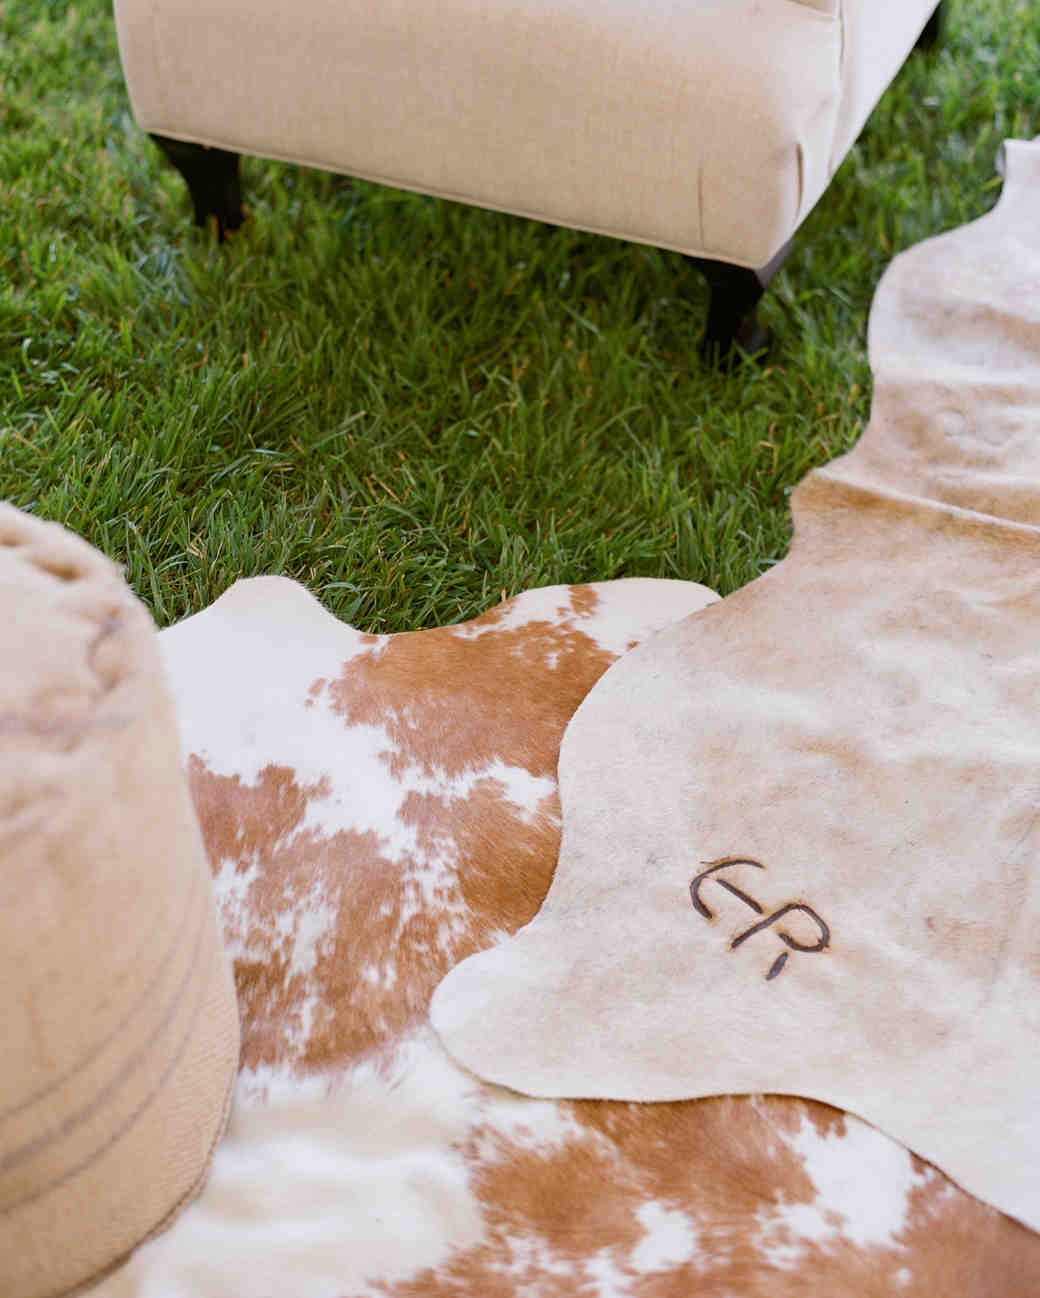 callie-eric-wedding-hides-433-s112113-0815.jpg